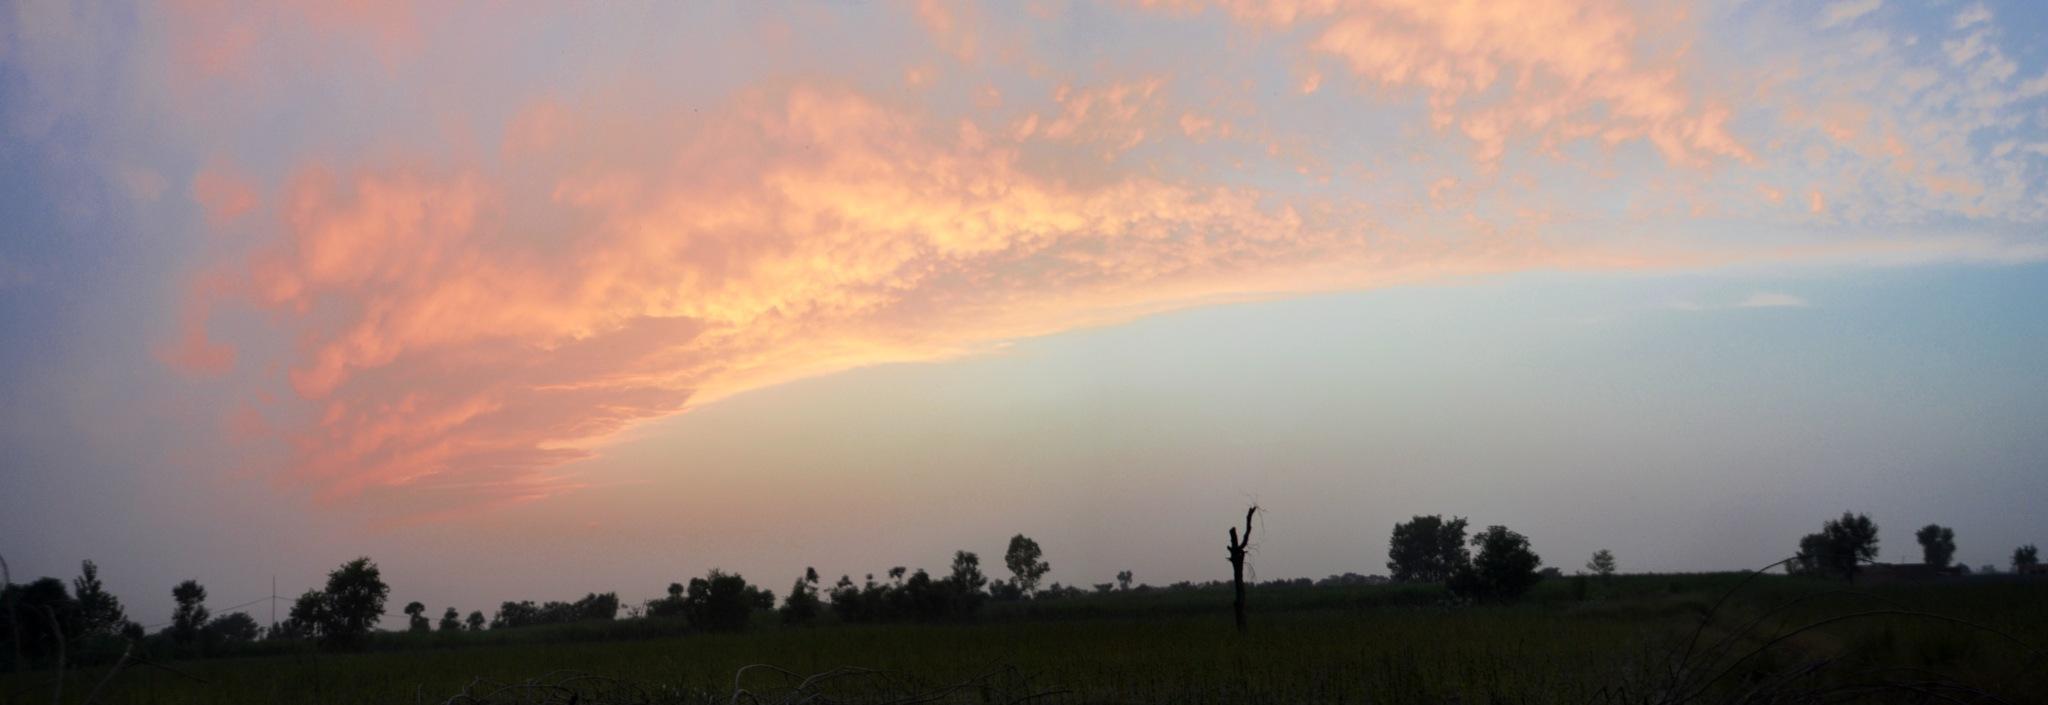 Sky by SumbalAwan